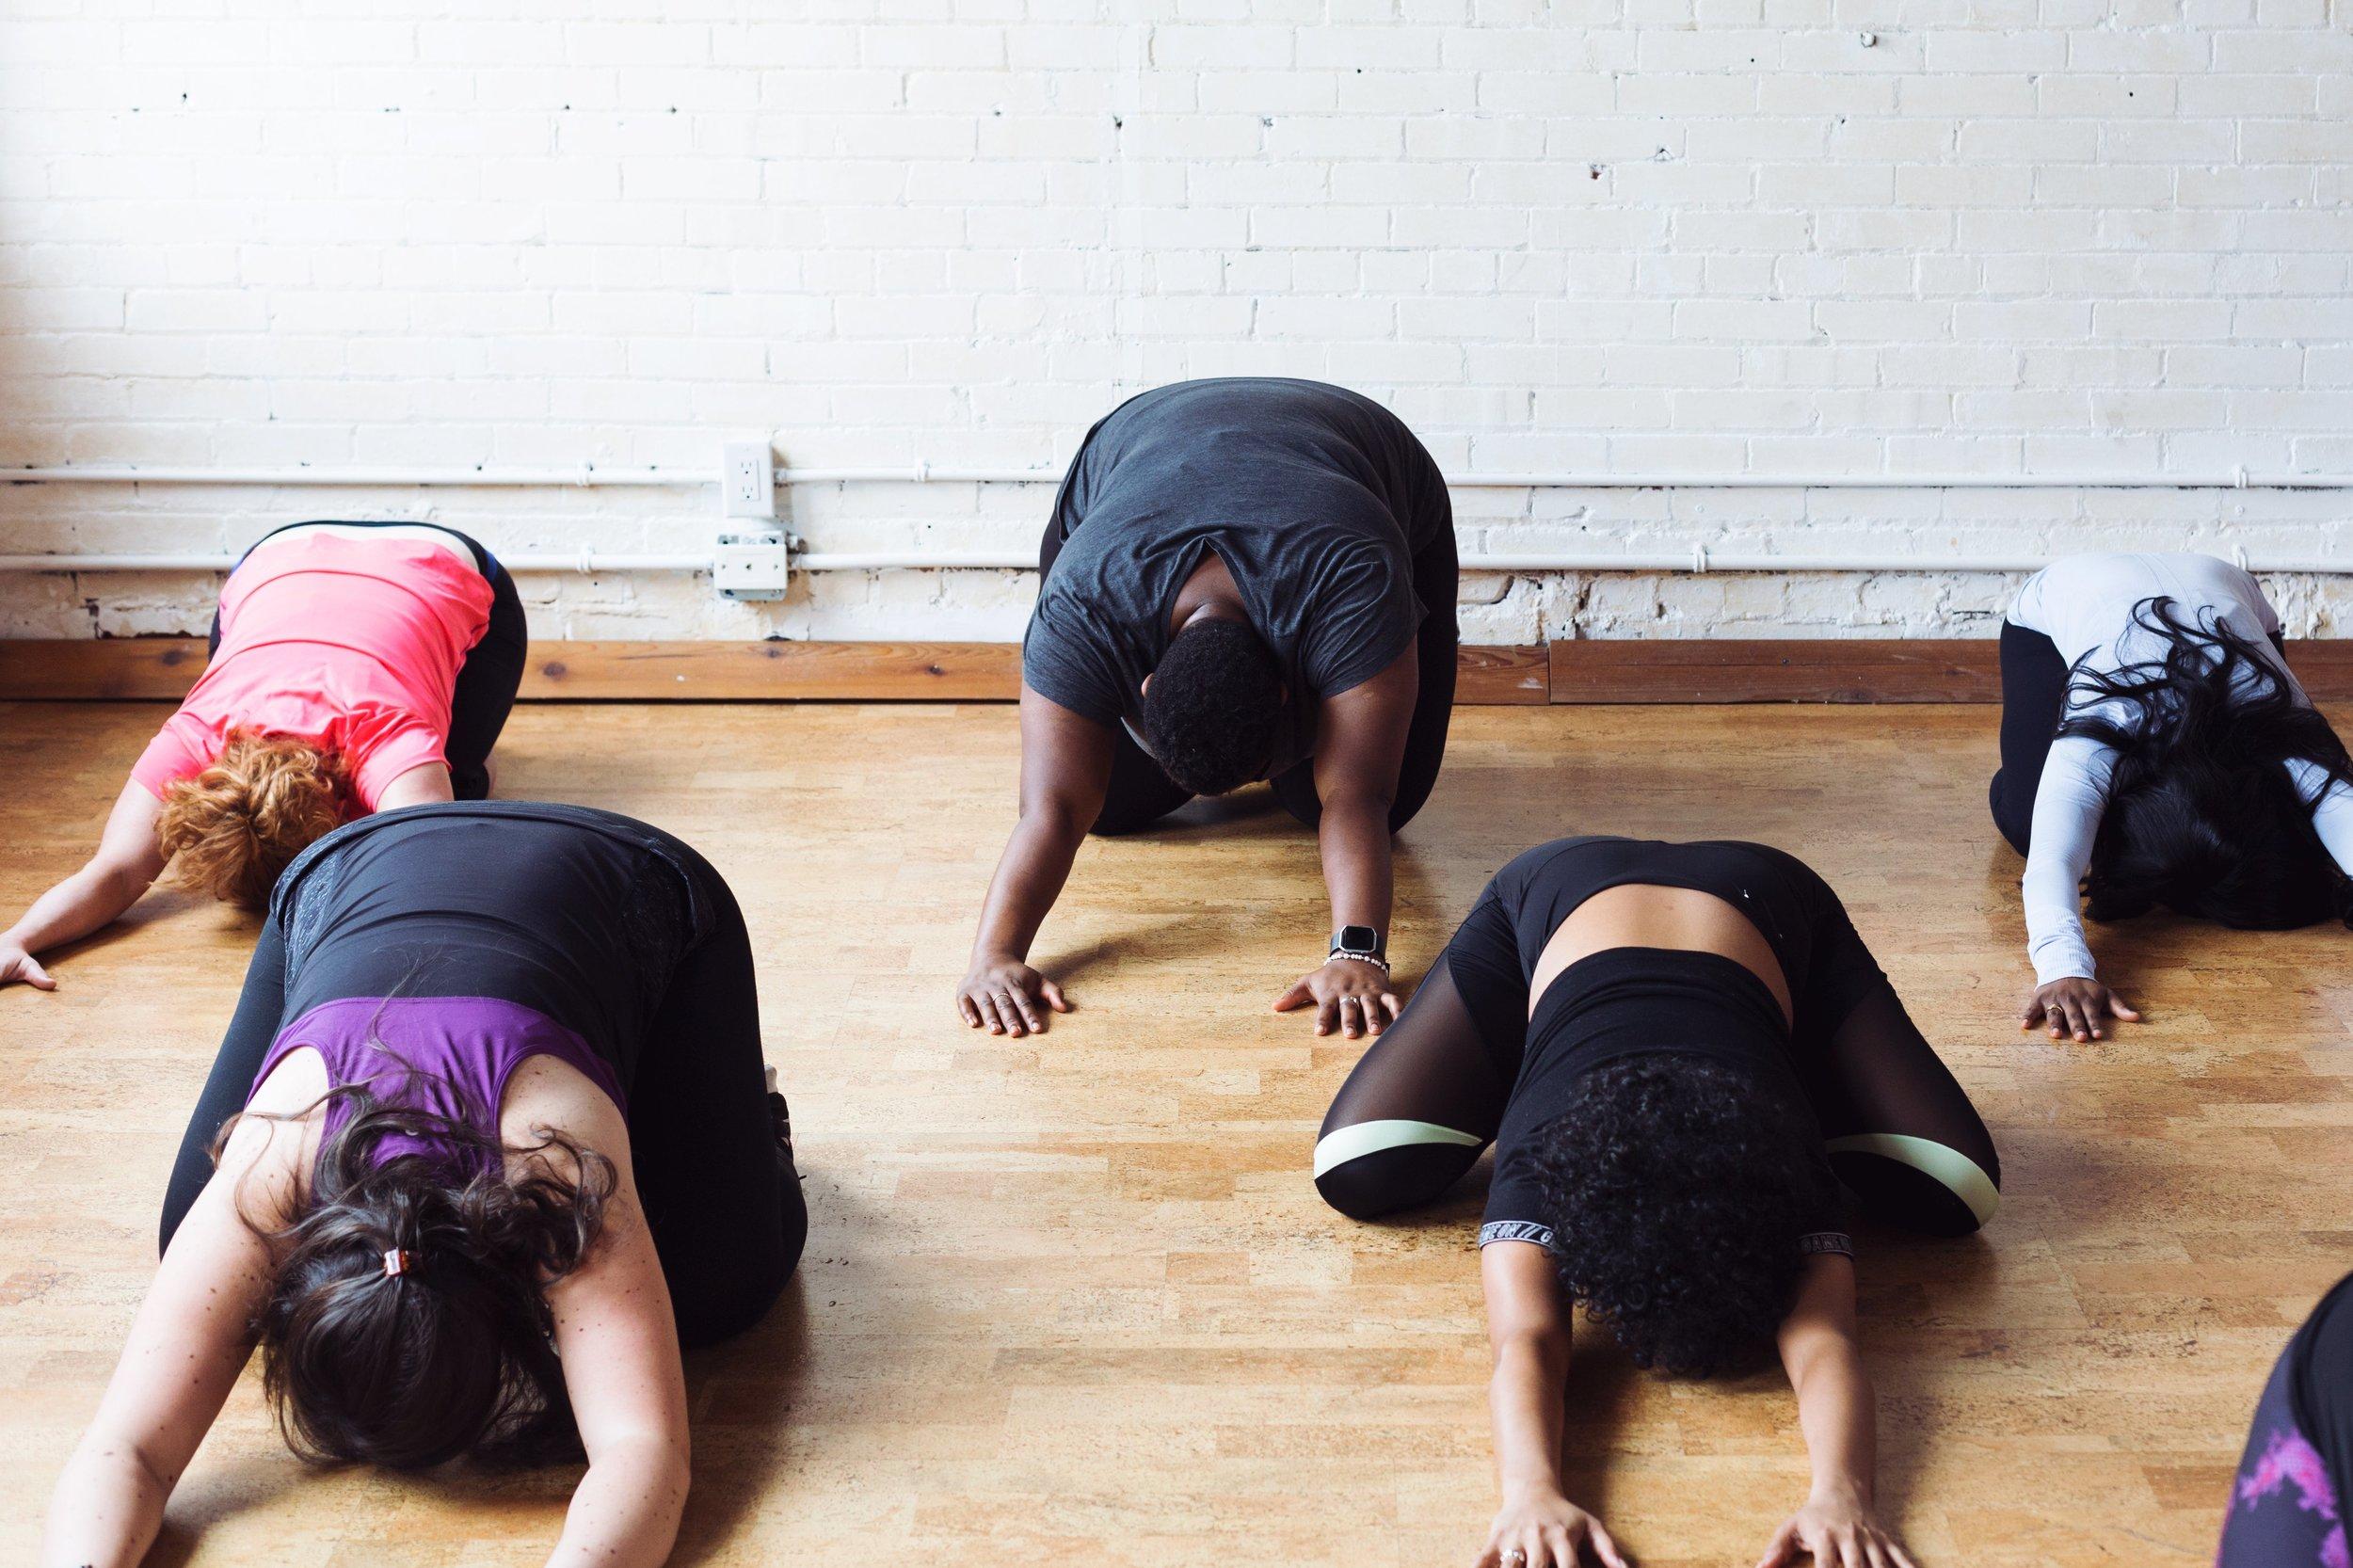 #yogiproblems. -